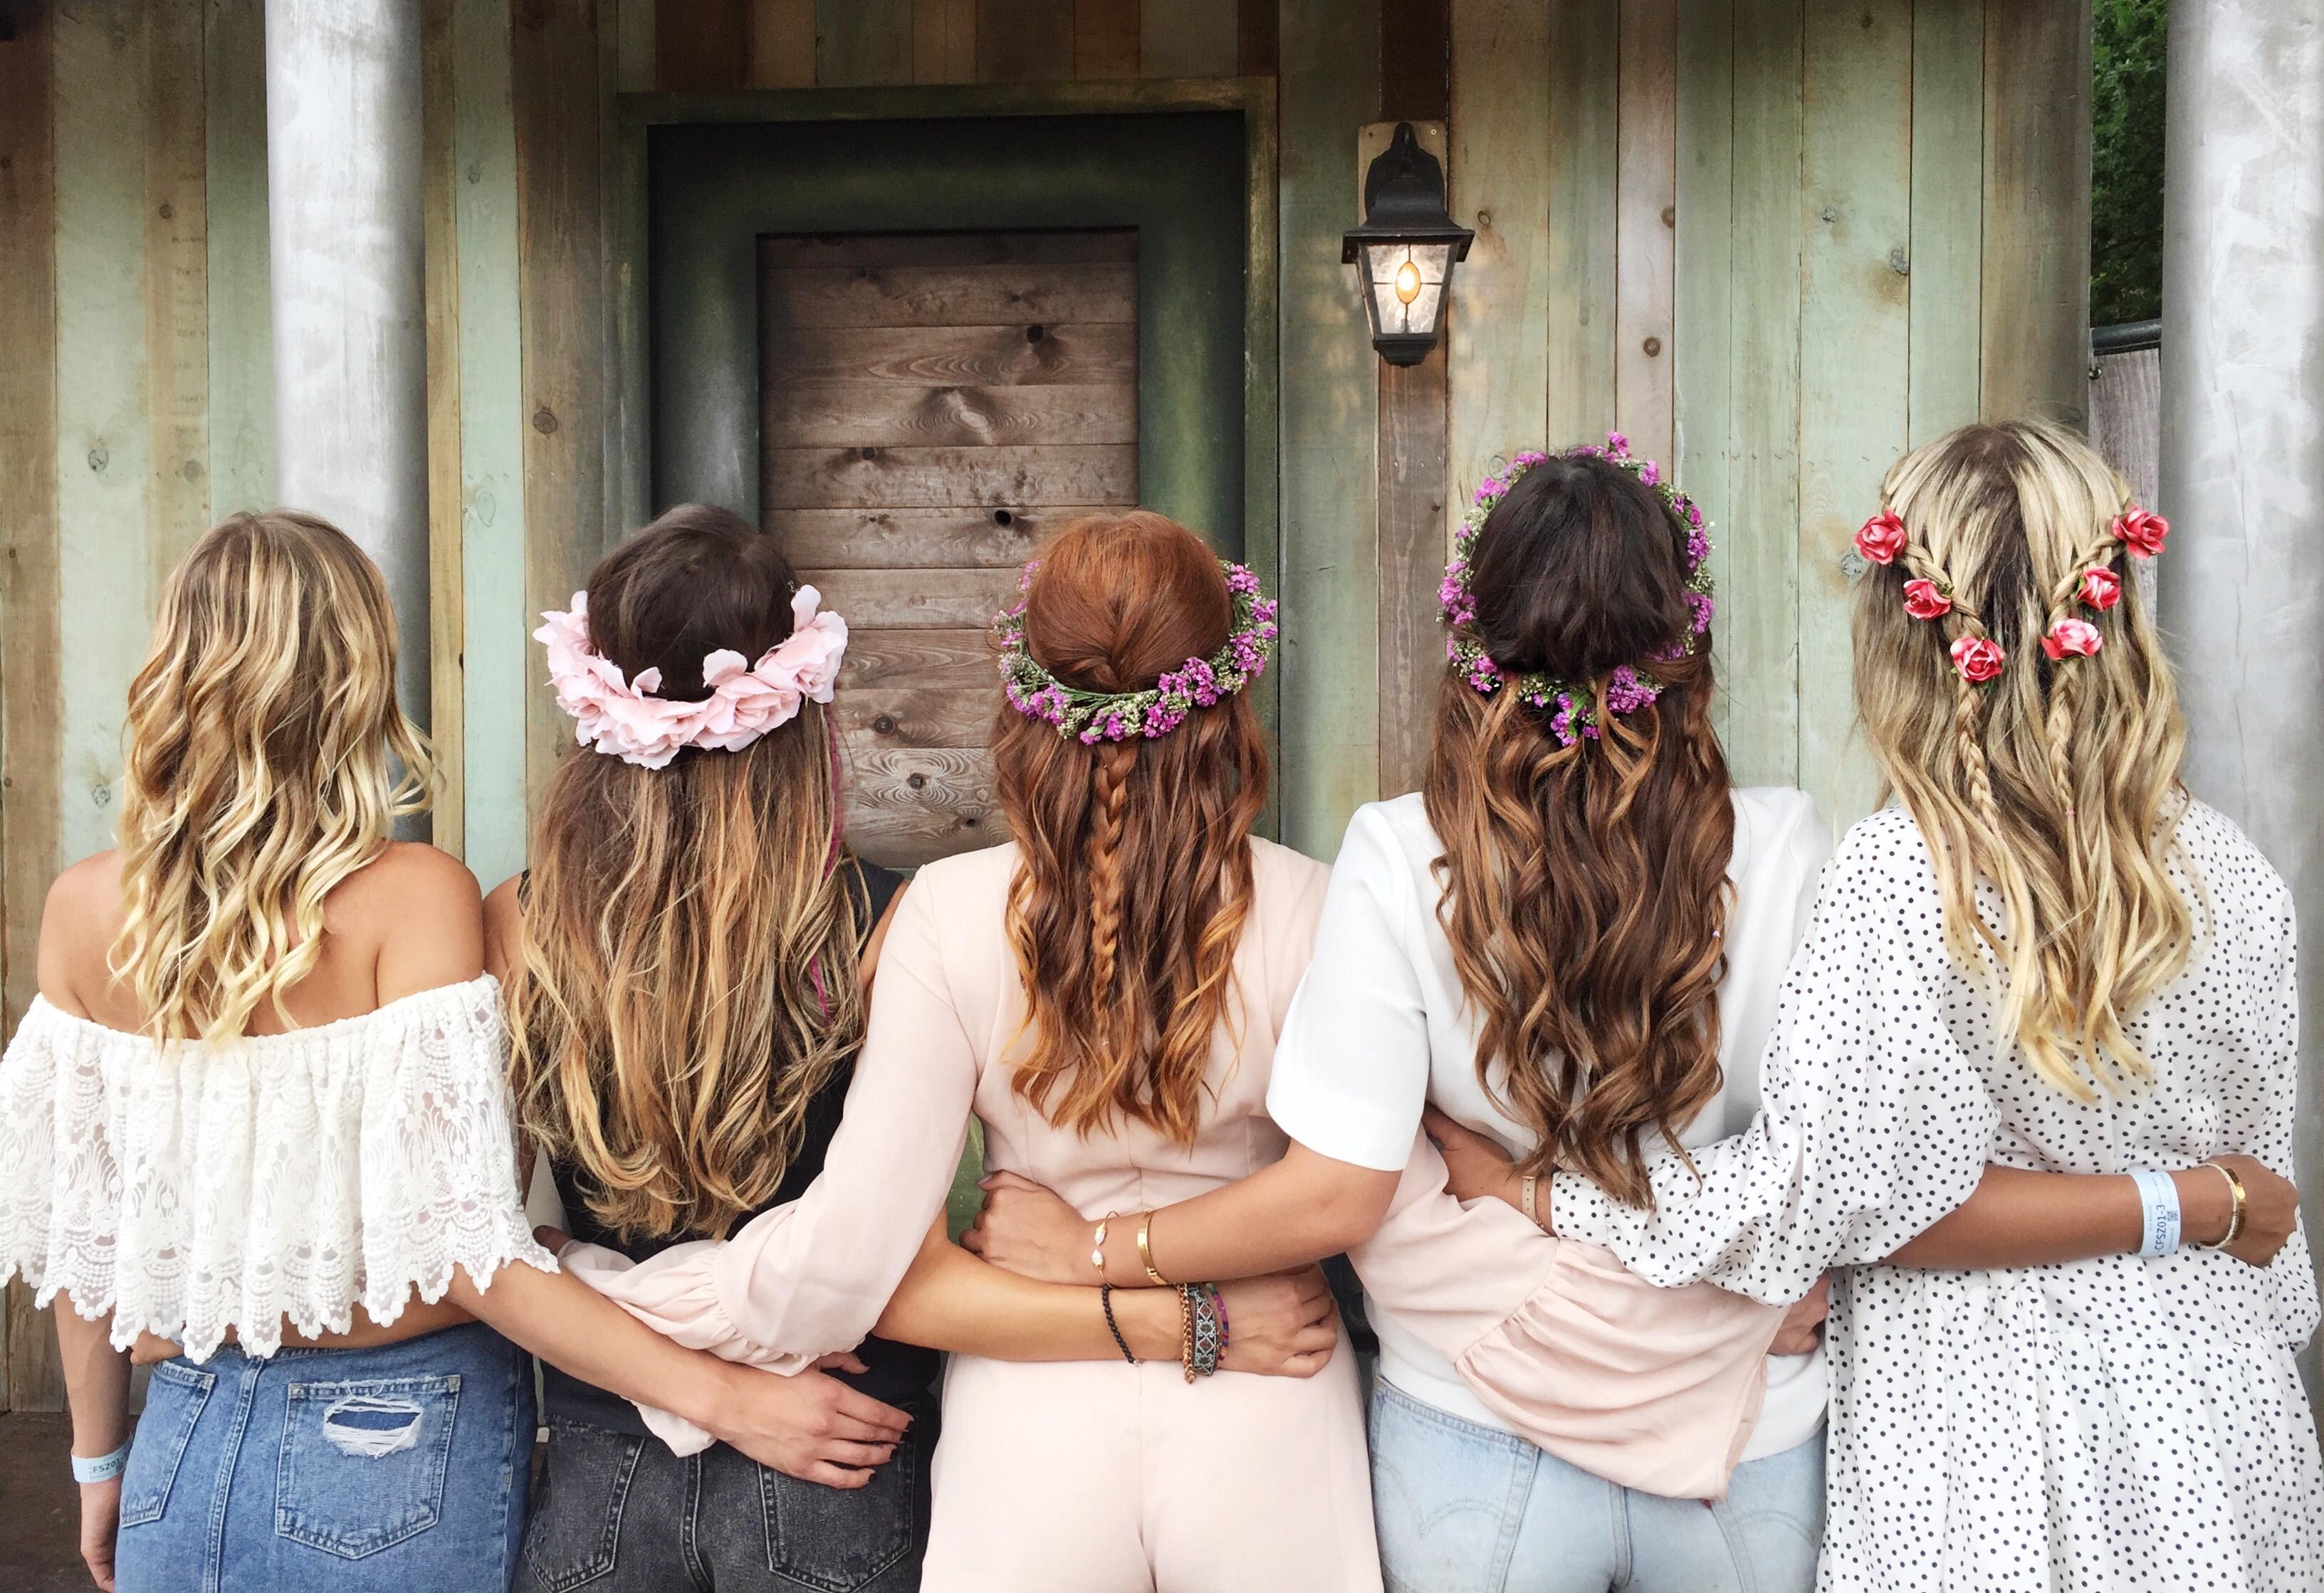 Fresh Festival Hair mit Batiste Trockenshampoo | Werbung | How I met my outfit by Dana Lohmüller